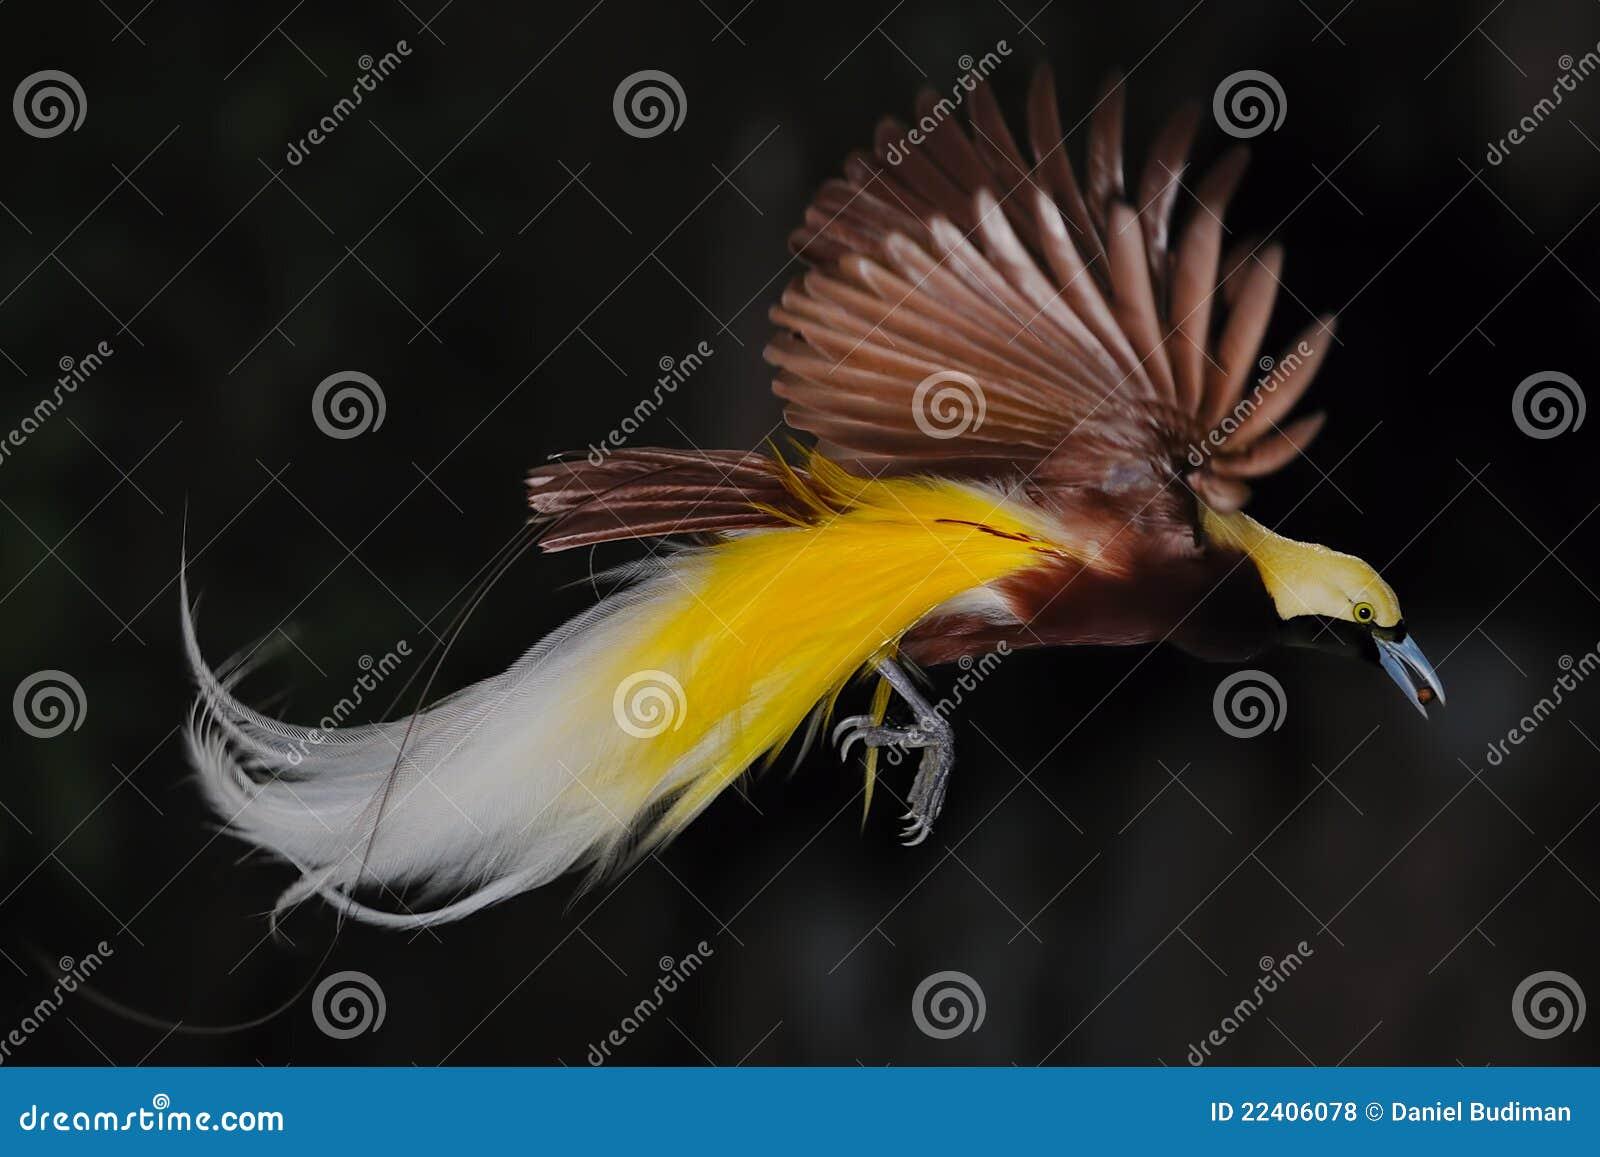 Pássaro de paraíso no vôo